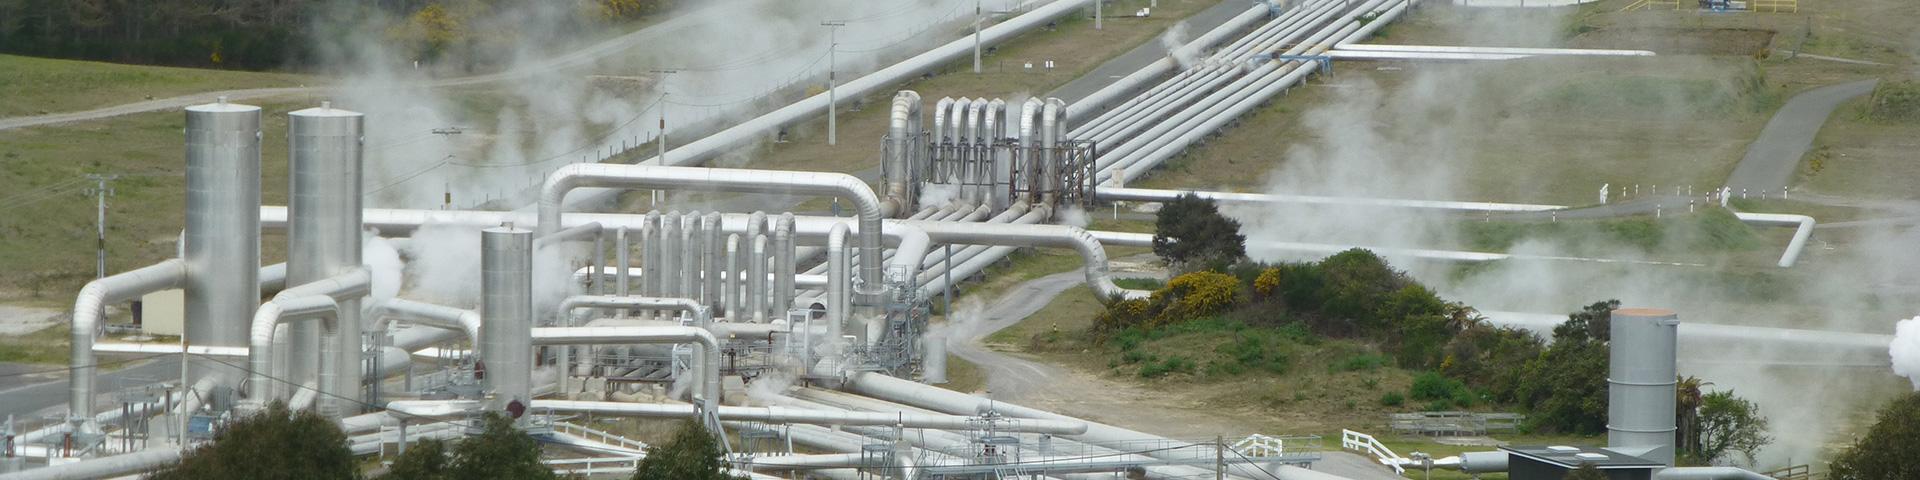 Geothermal exploitation, New Zealand